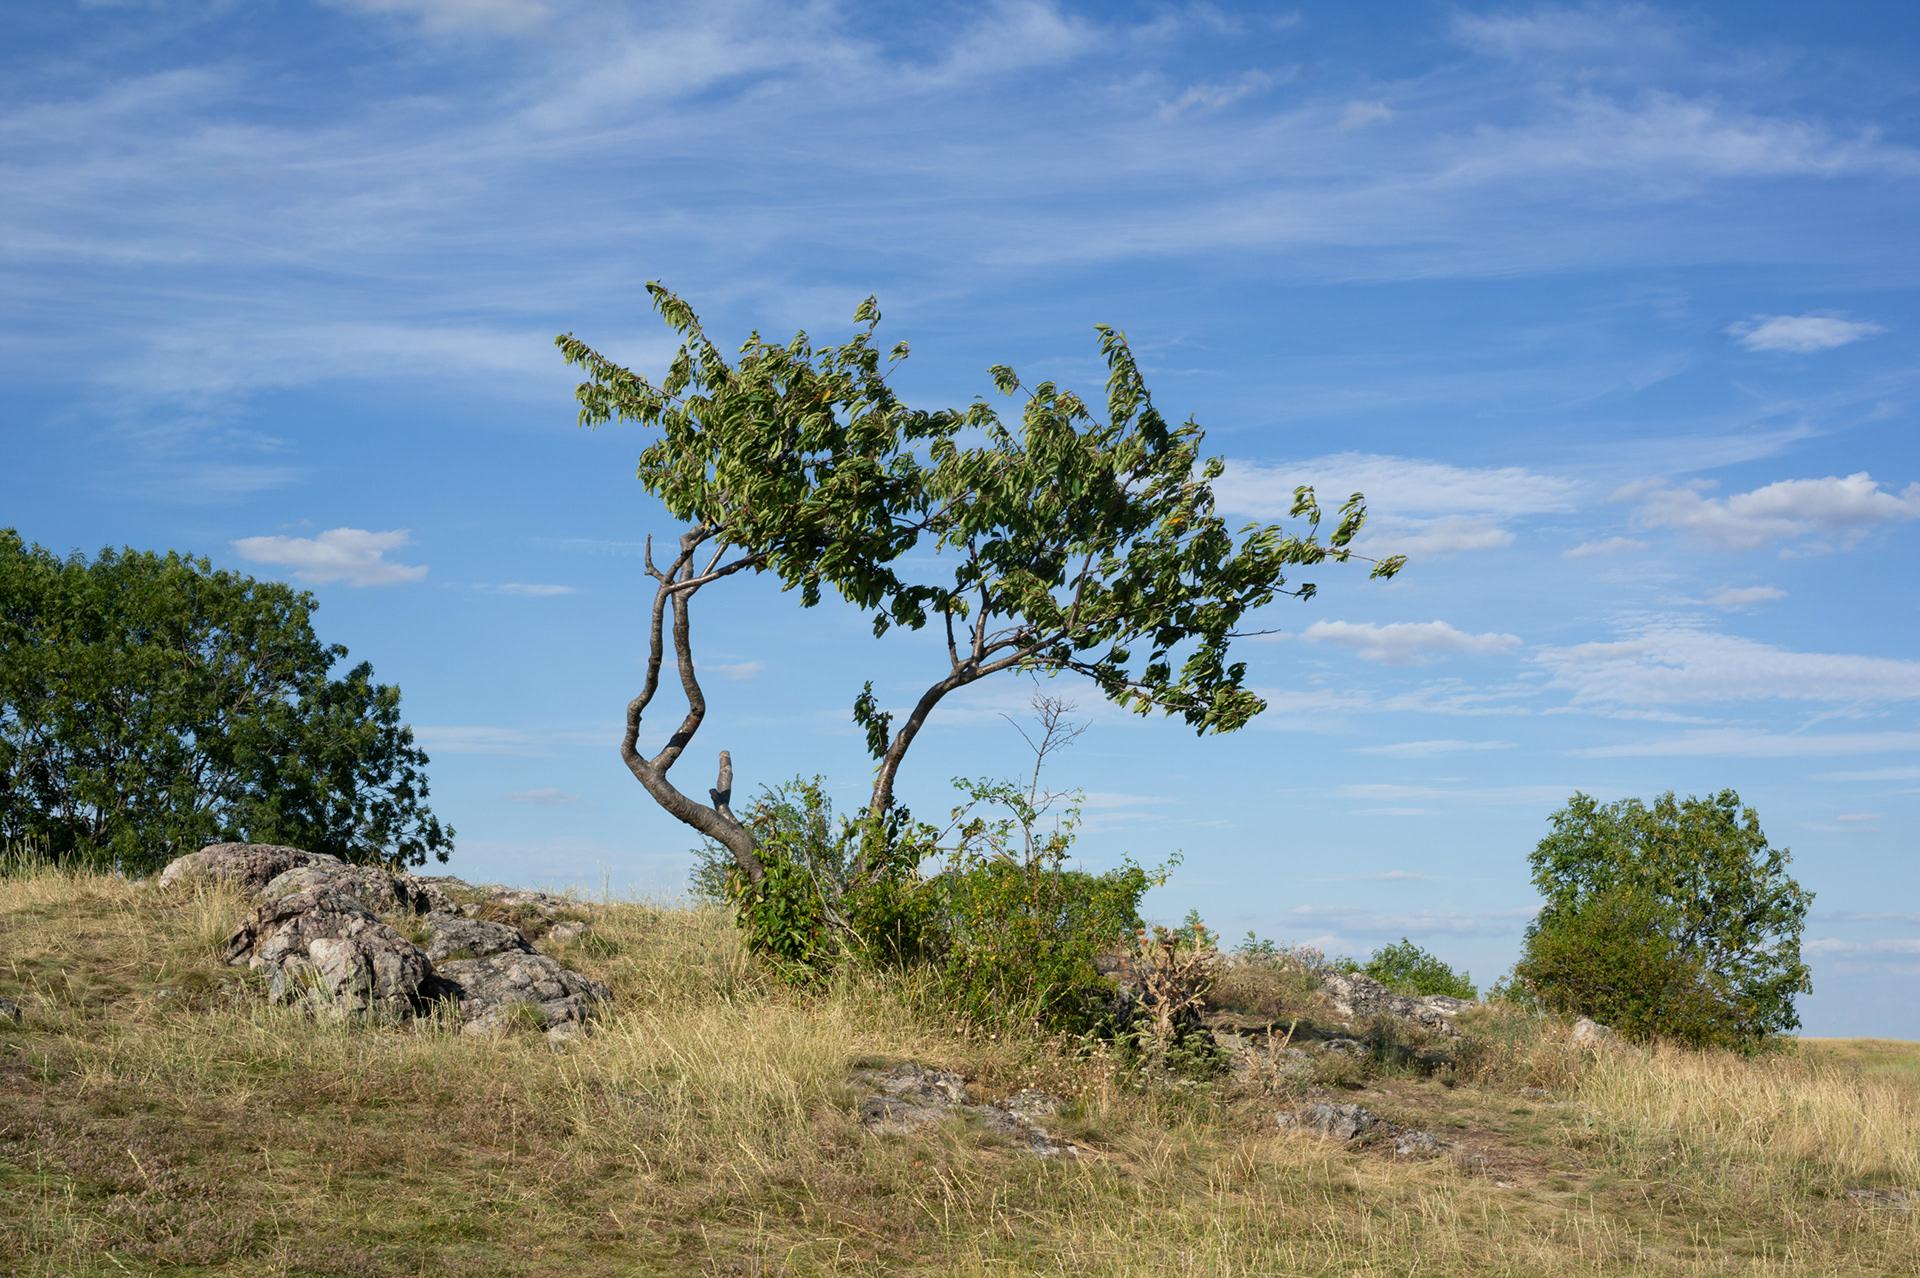 Landscape photography of tree in the summer, Divoká Šárka, Prague, Czech Republic, 2020